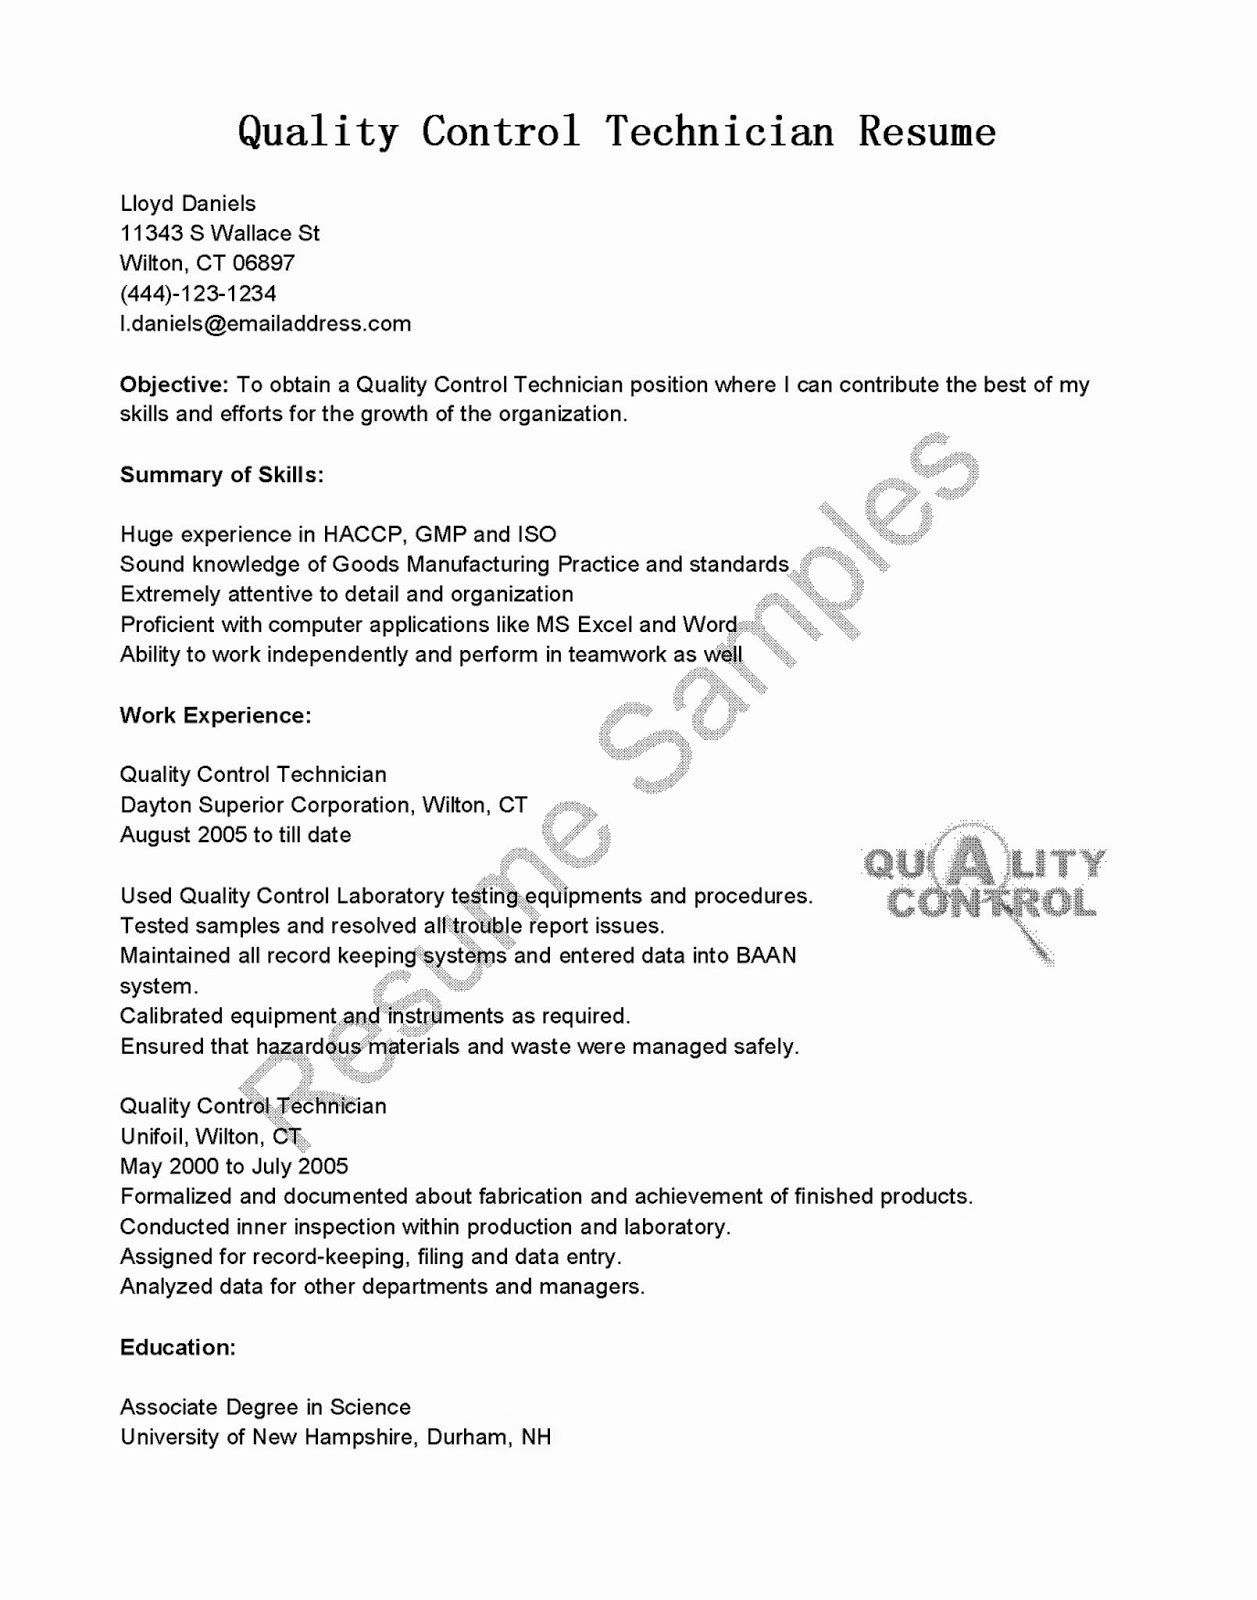 Lube Technician Job Description Resume Beautiful Resume Samples Quality Control Technician Resume Sample Cover Letter Example Resume Sample Resume